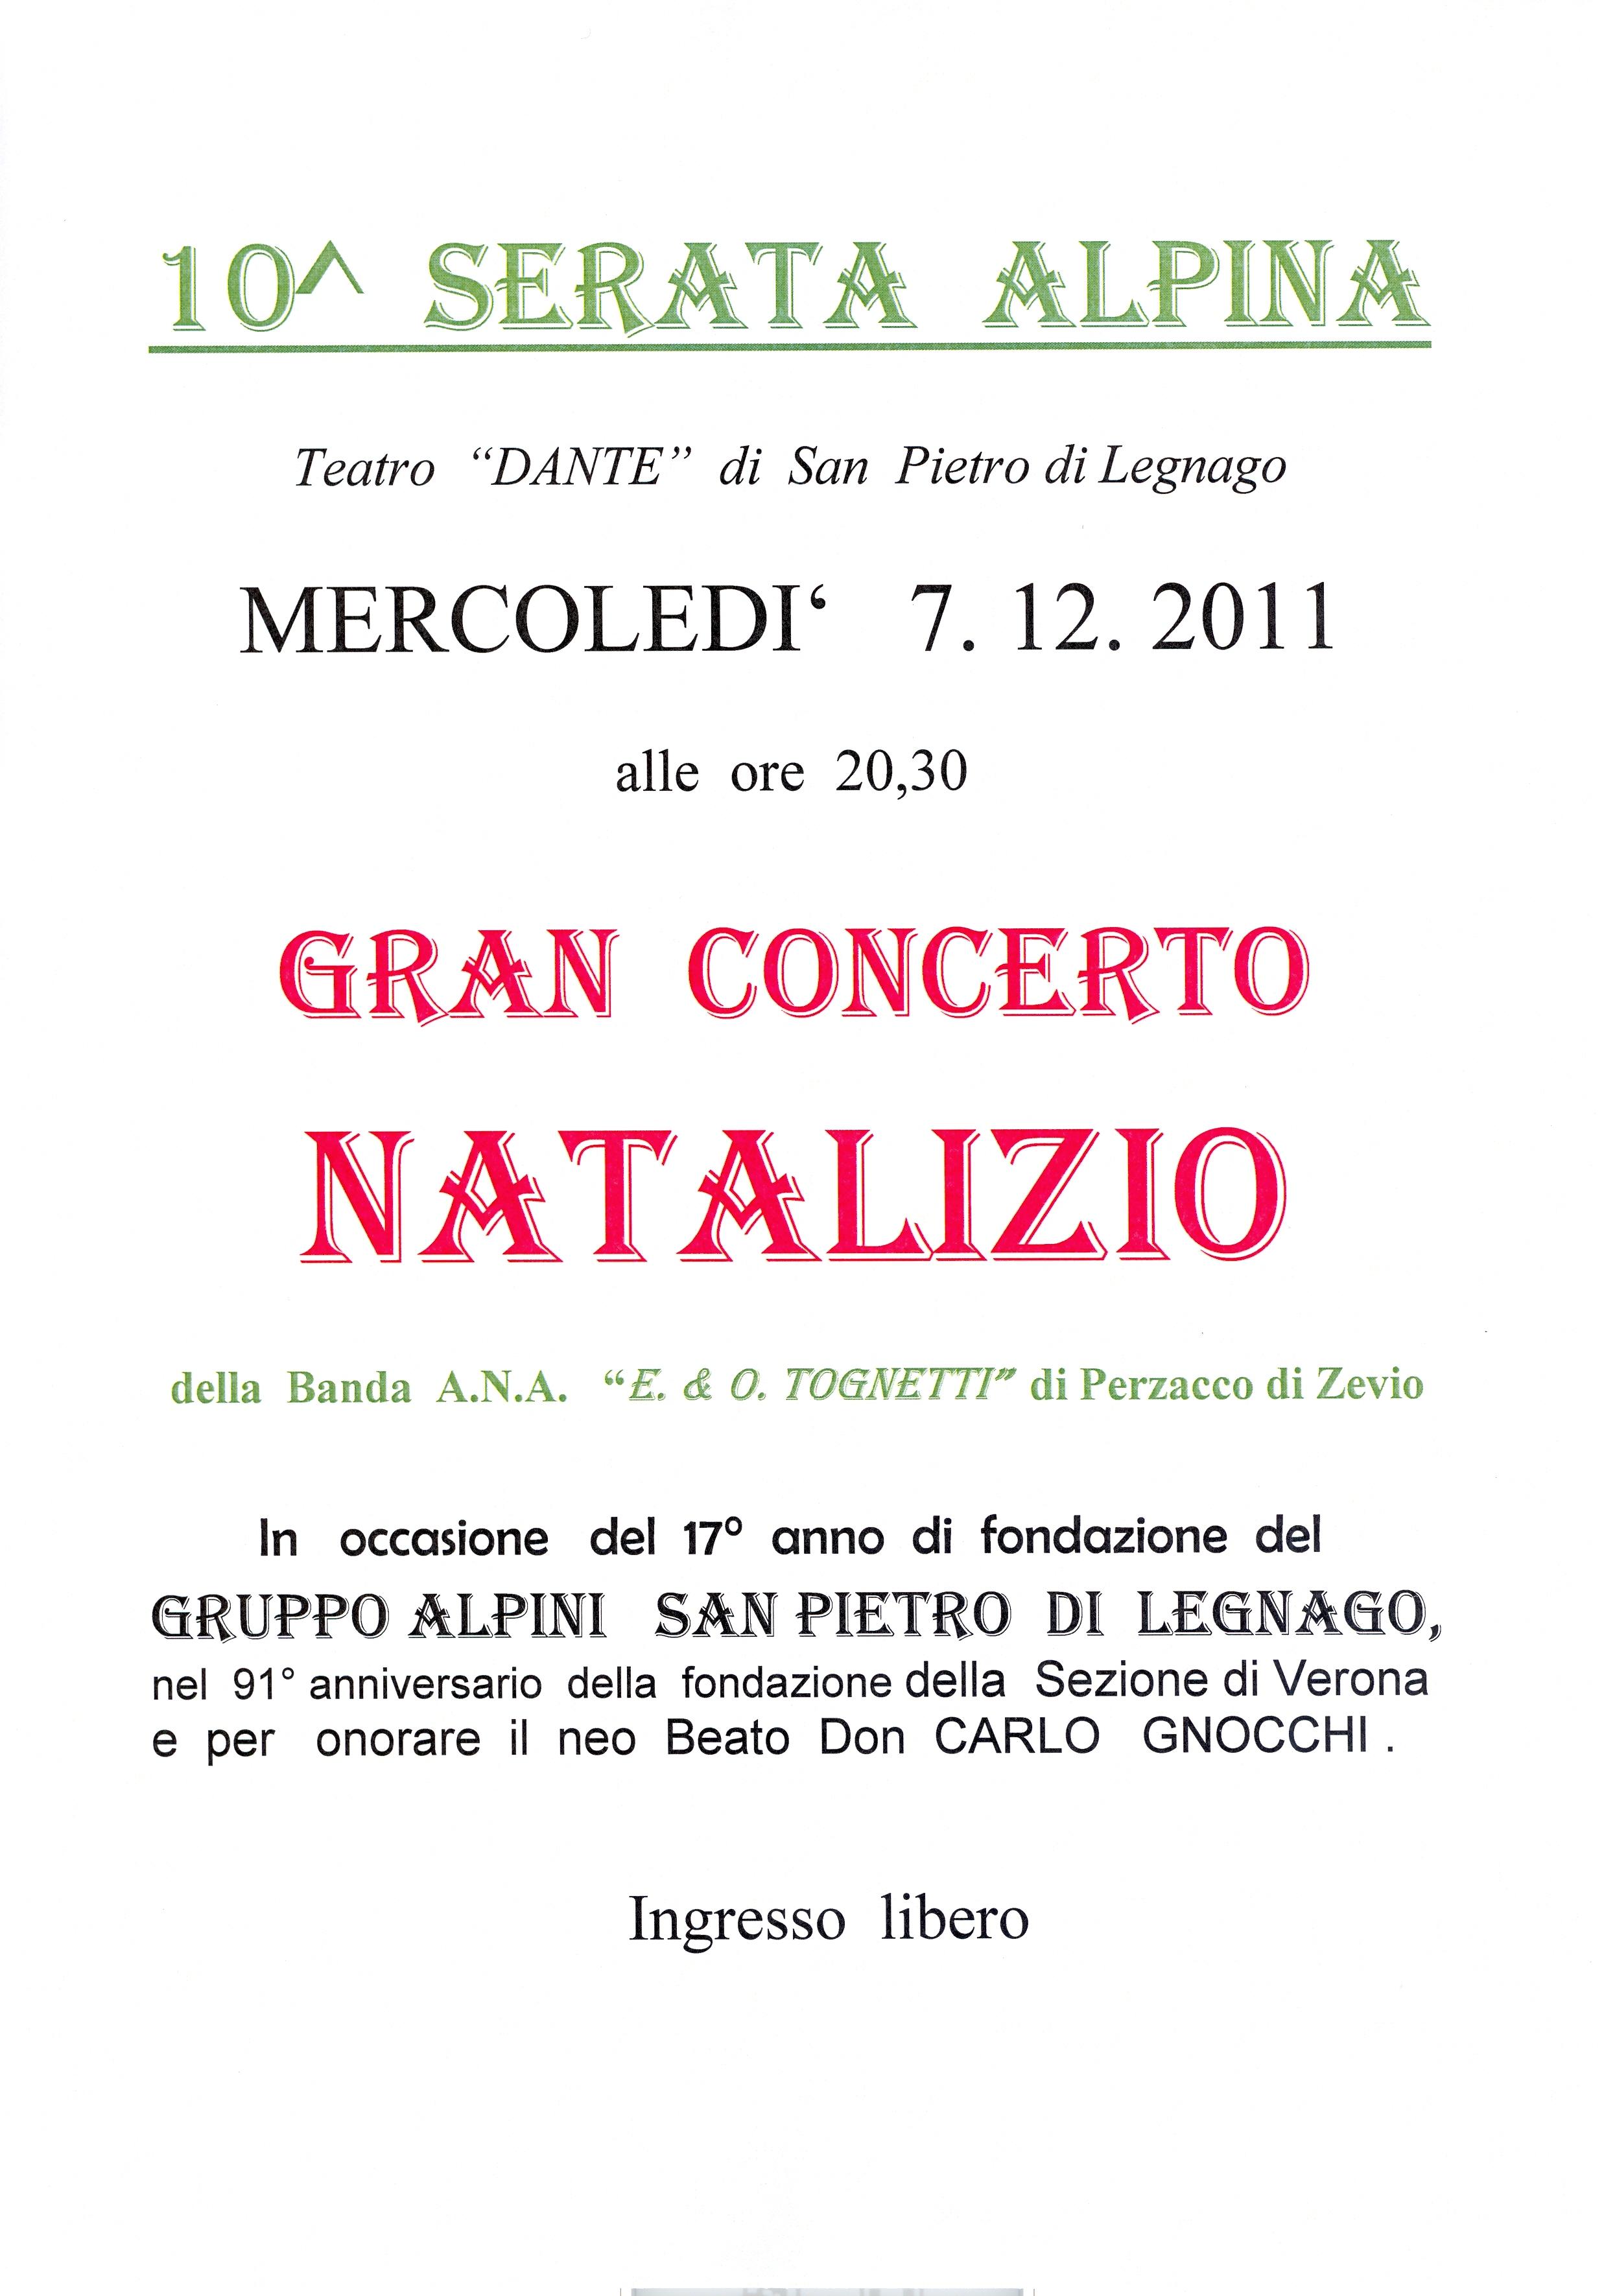 San Pietro Di Legnago Verona teatro dante di san pietro di legnago 10 serata alpina